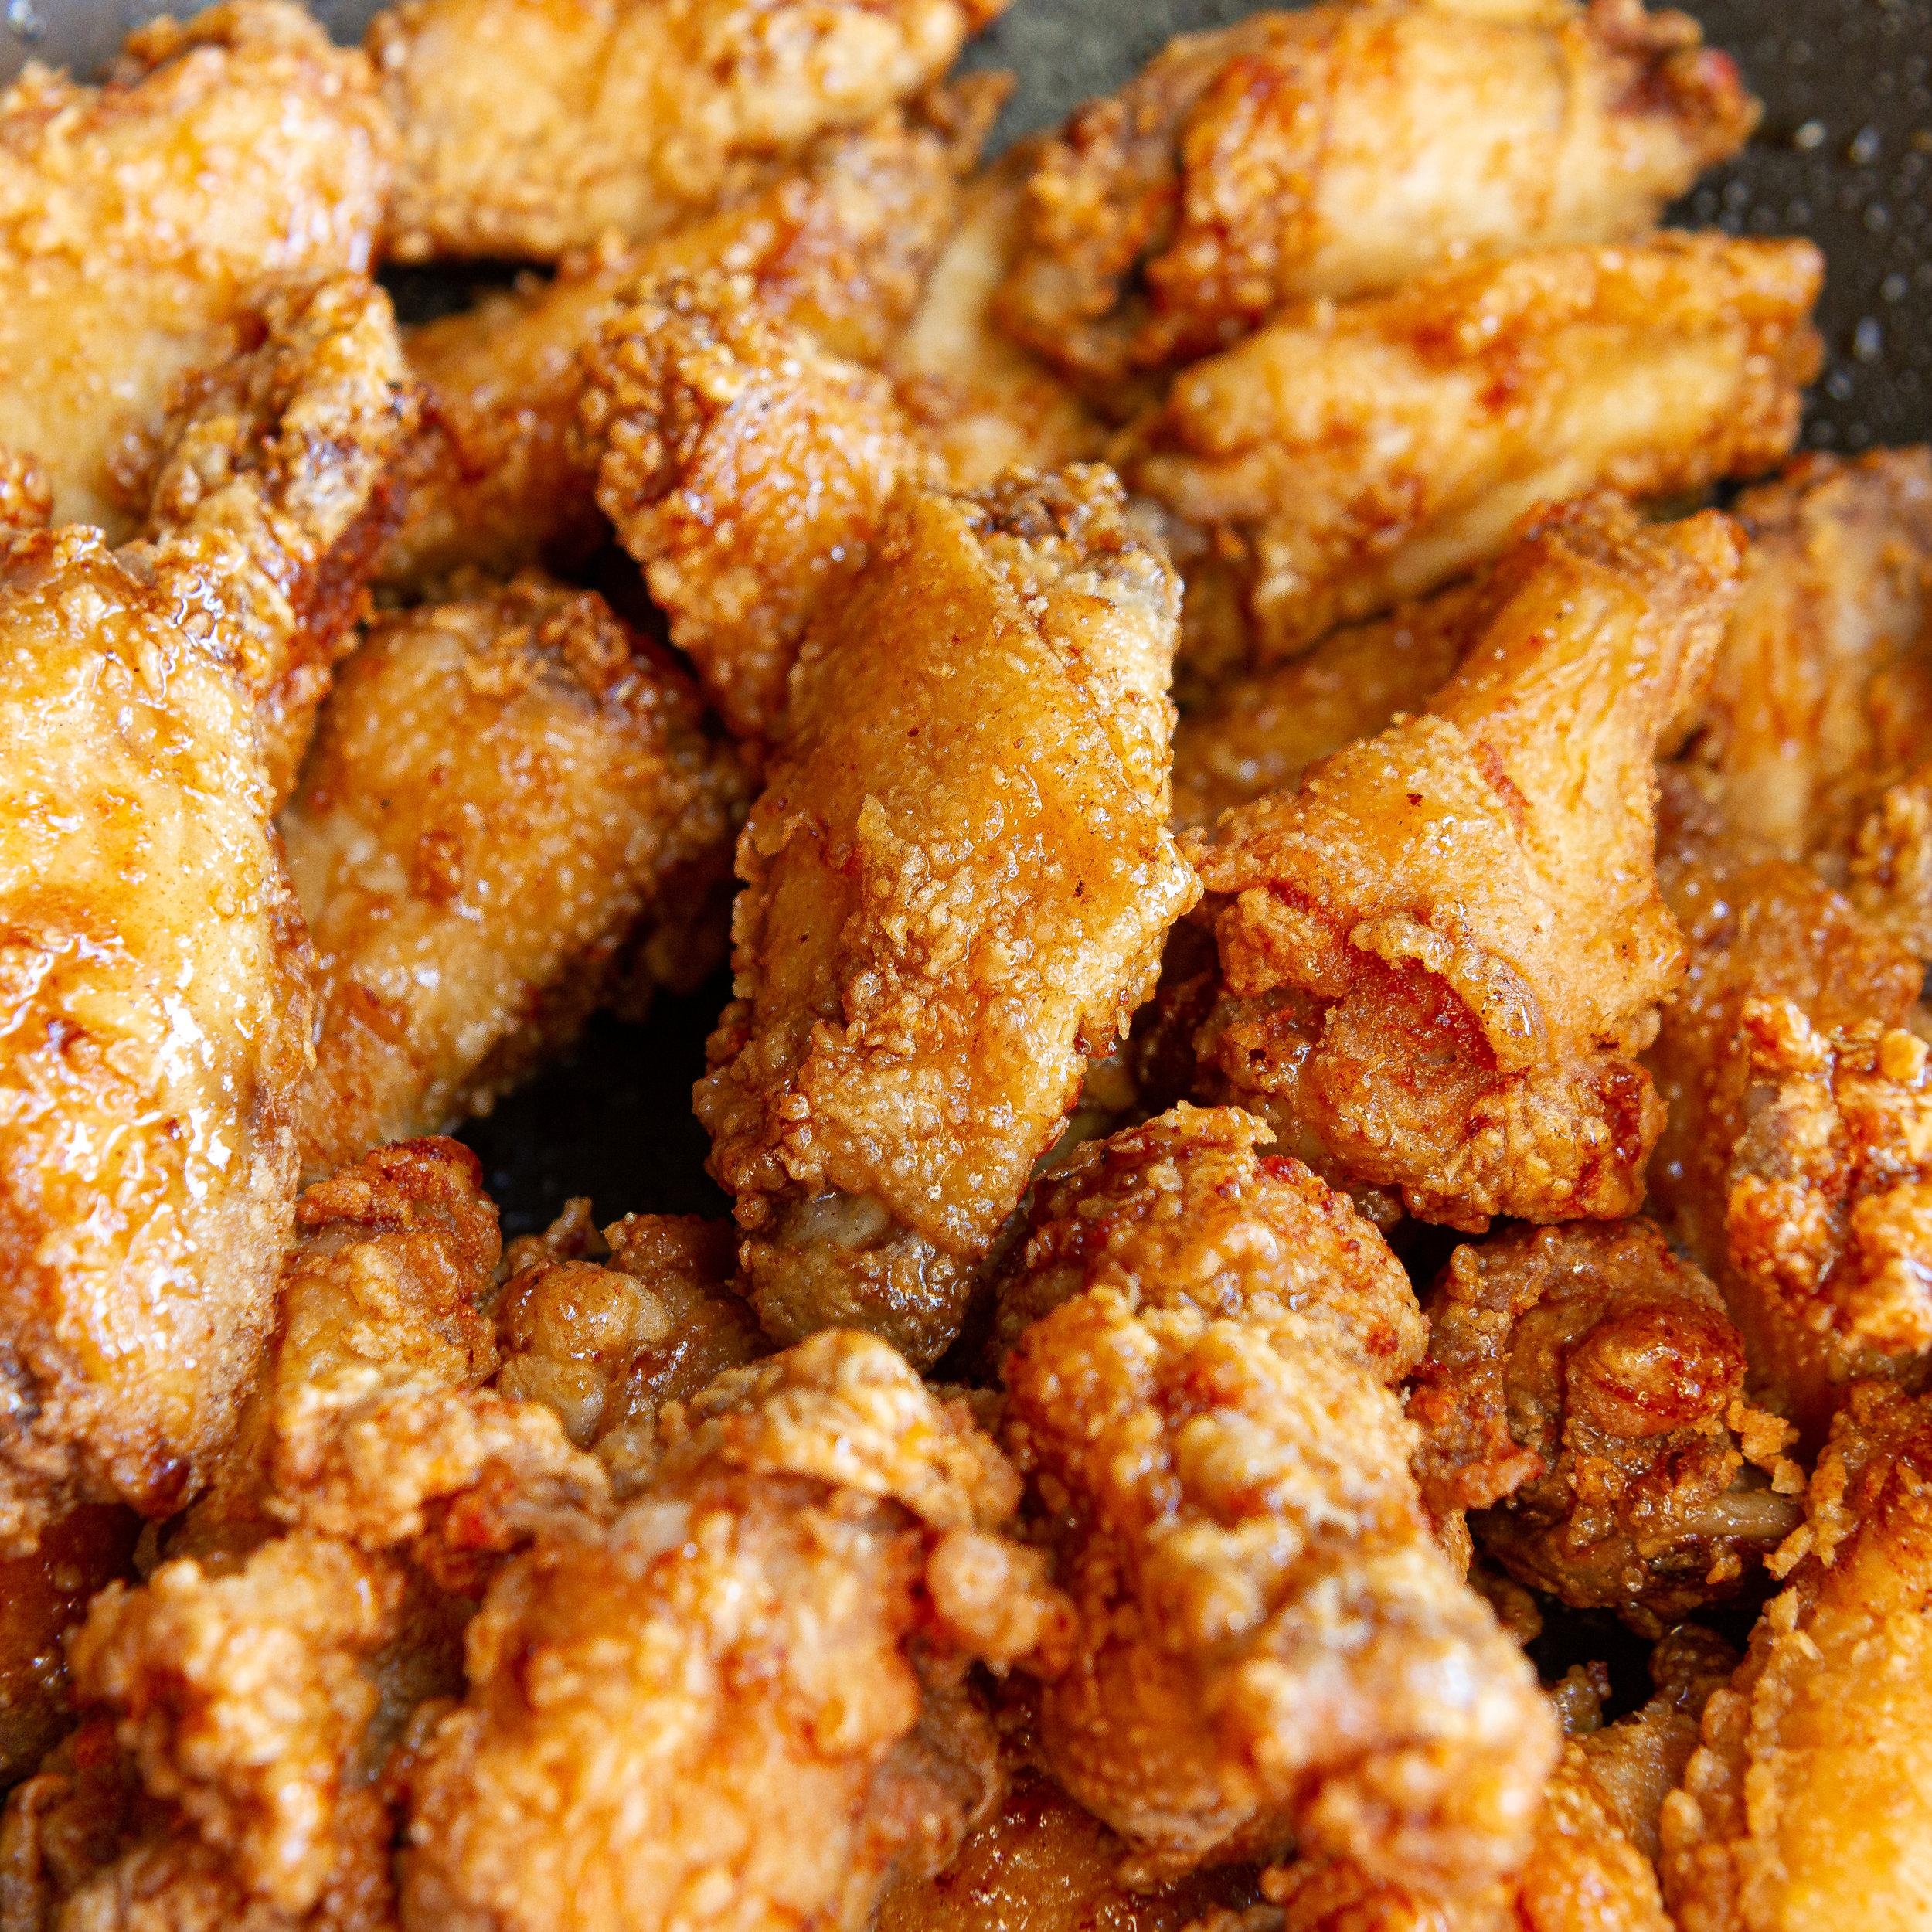 Vietnamese Fish Sauce Chicken Wings (Ga Chien Nuoc Mam)